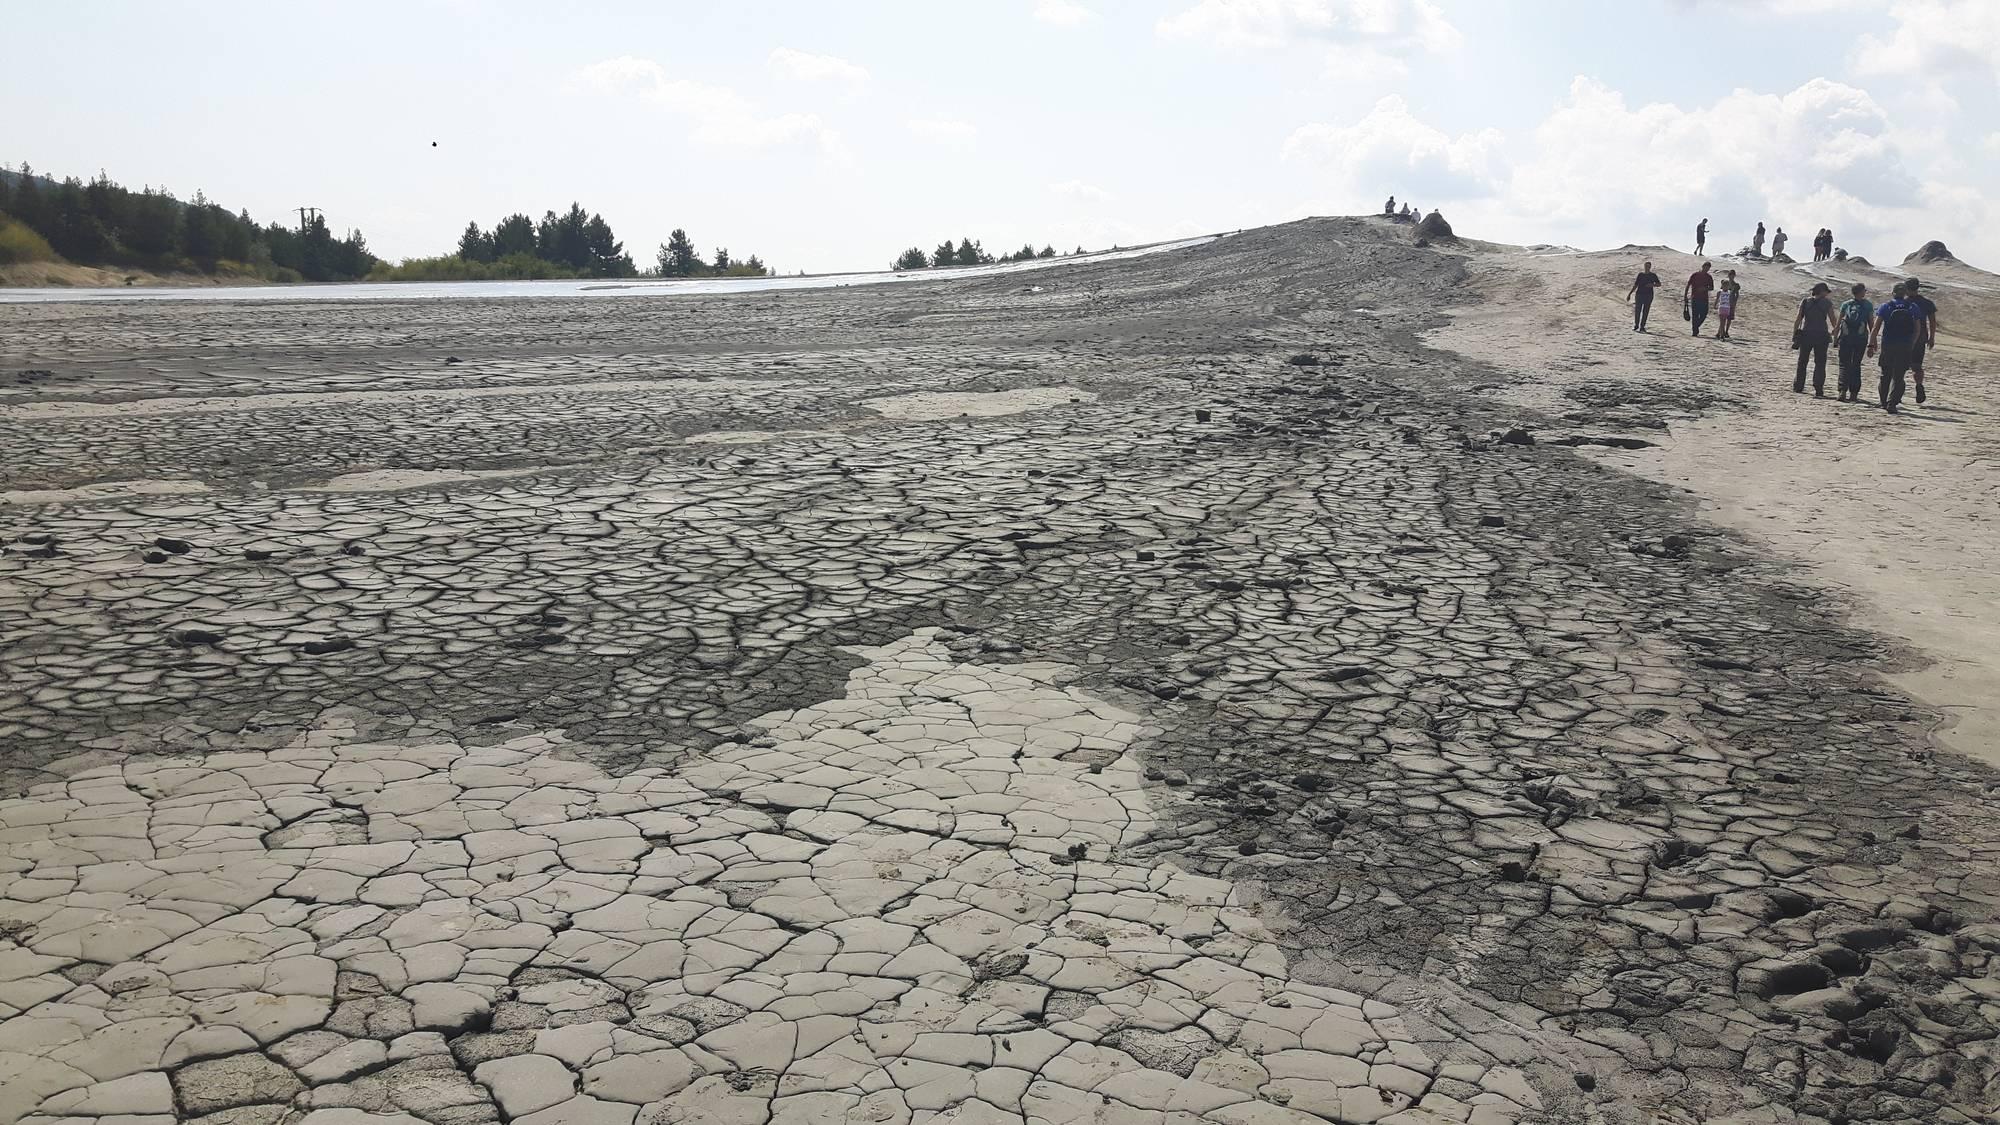 Volcan-de-boue-de-Berca_07-09-2018_03